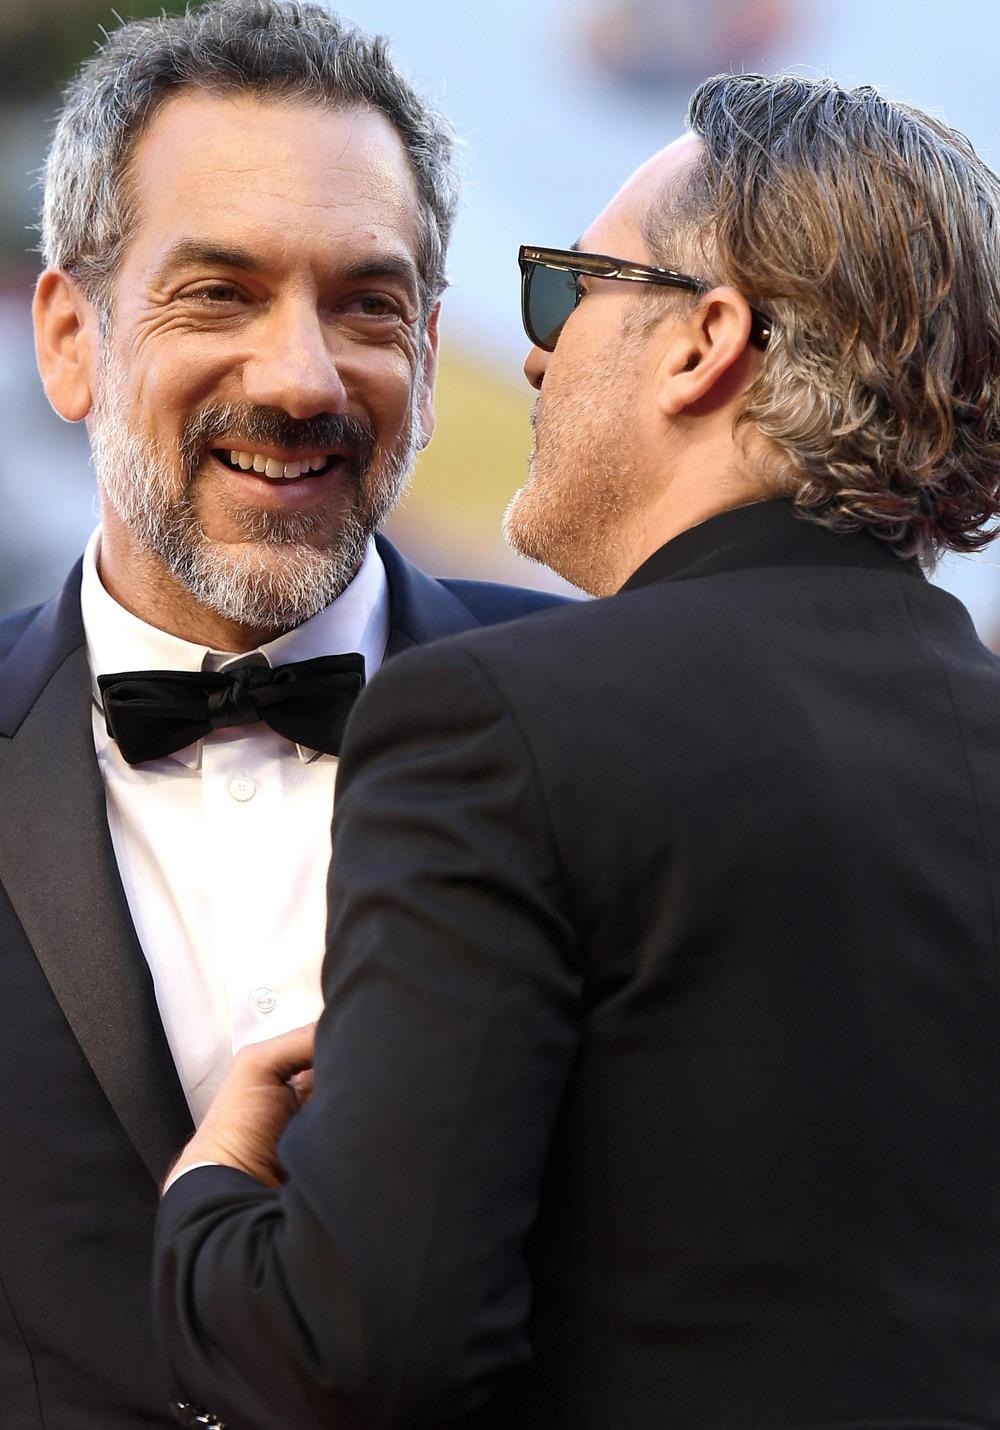 Venezia 76, tutti in piedi per il Joker di Joaquin Phoenix - In fotoTodd Phillips e Joaquin Phoenix per il film <em>Joker</em>.